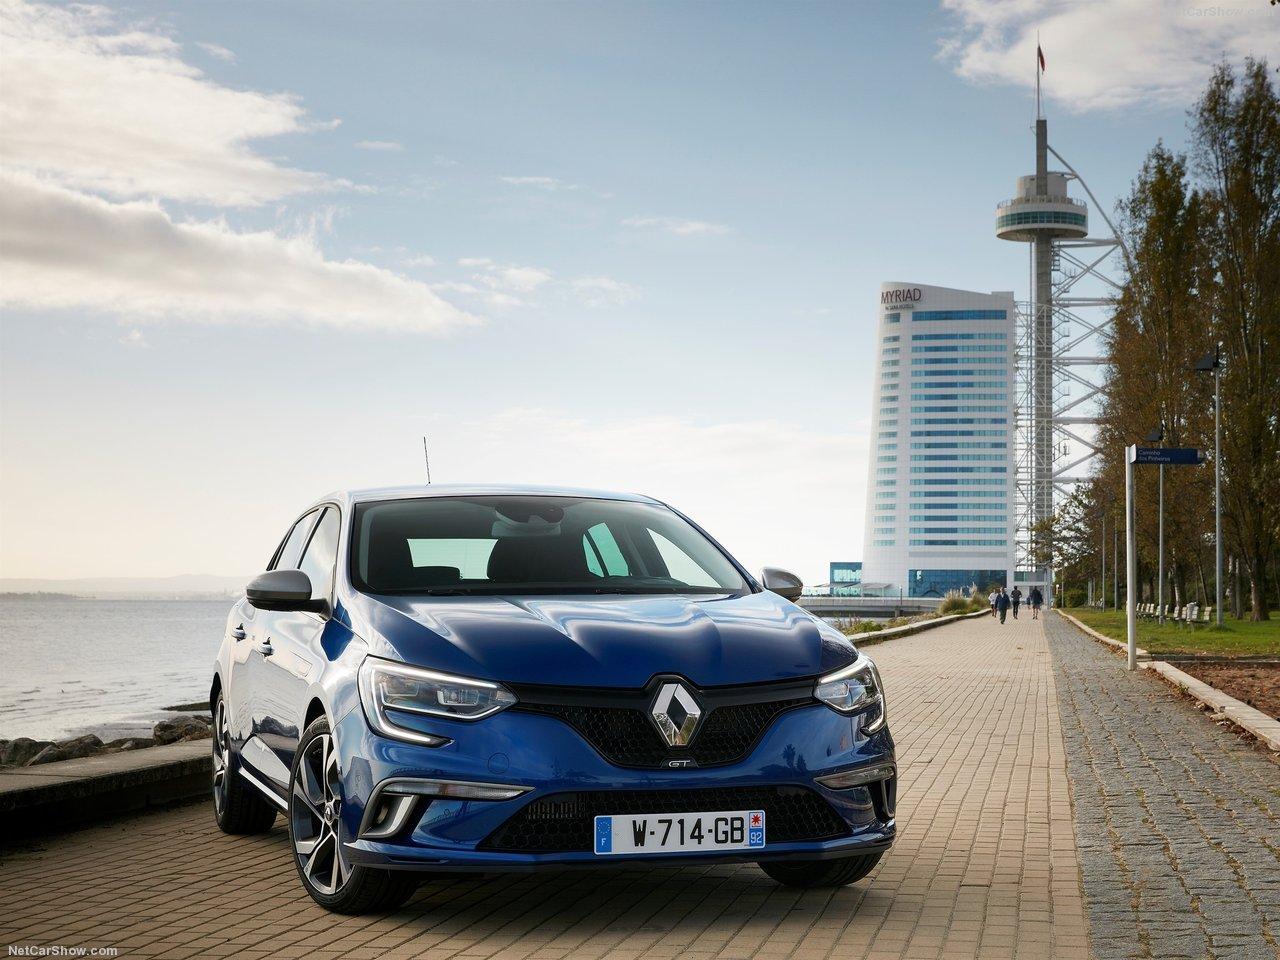 Renault-Megane_2016_1280x960_wallpaper_09